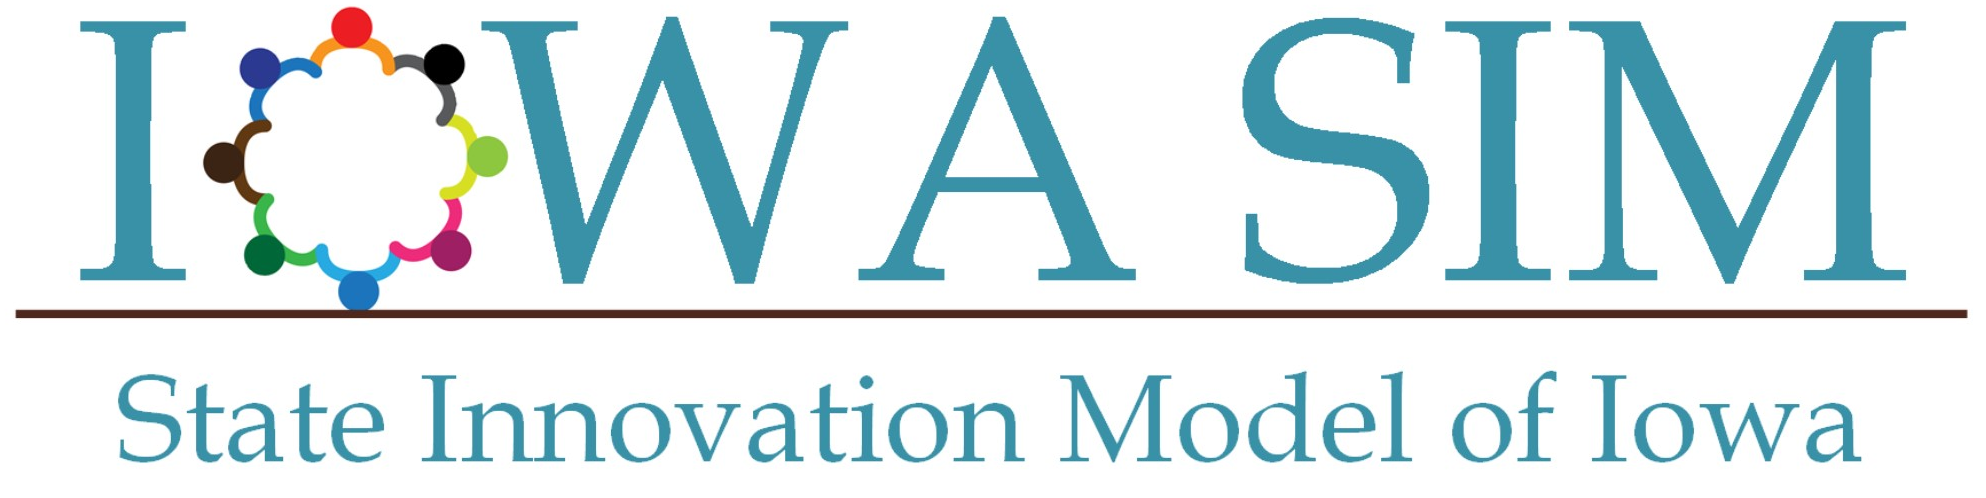 State Innovation Model of Iowa's (SIM) logo.